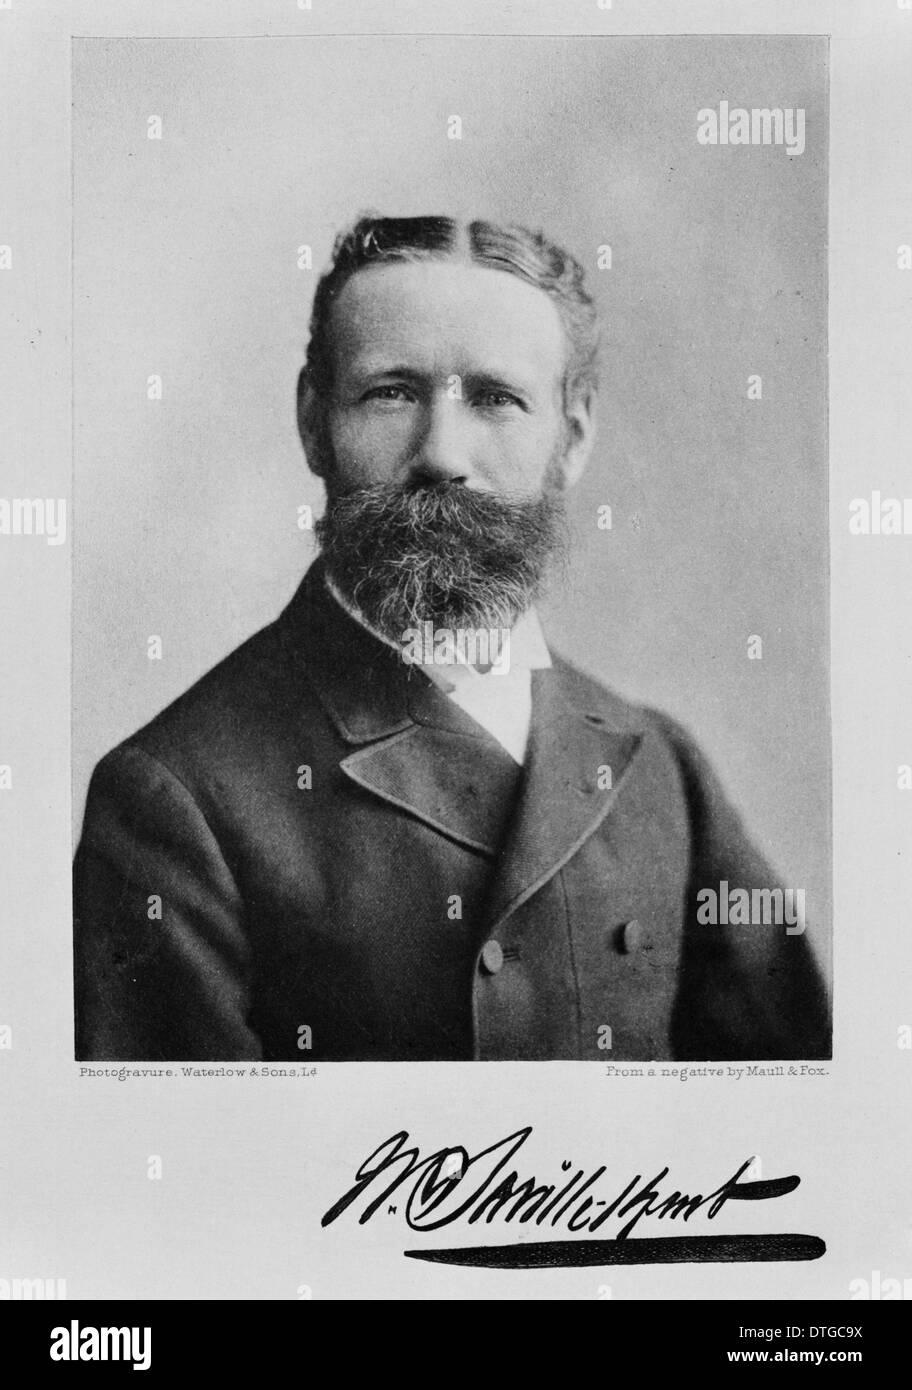 Mr William Saville Kent (1834-1910) - Stock Image